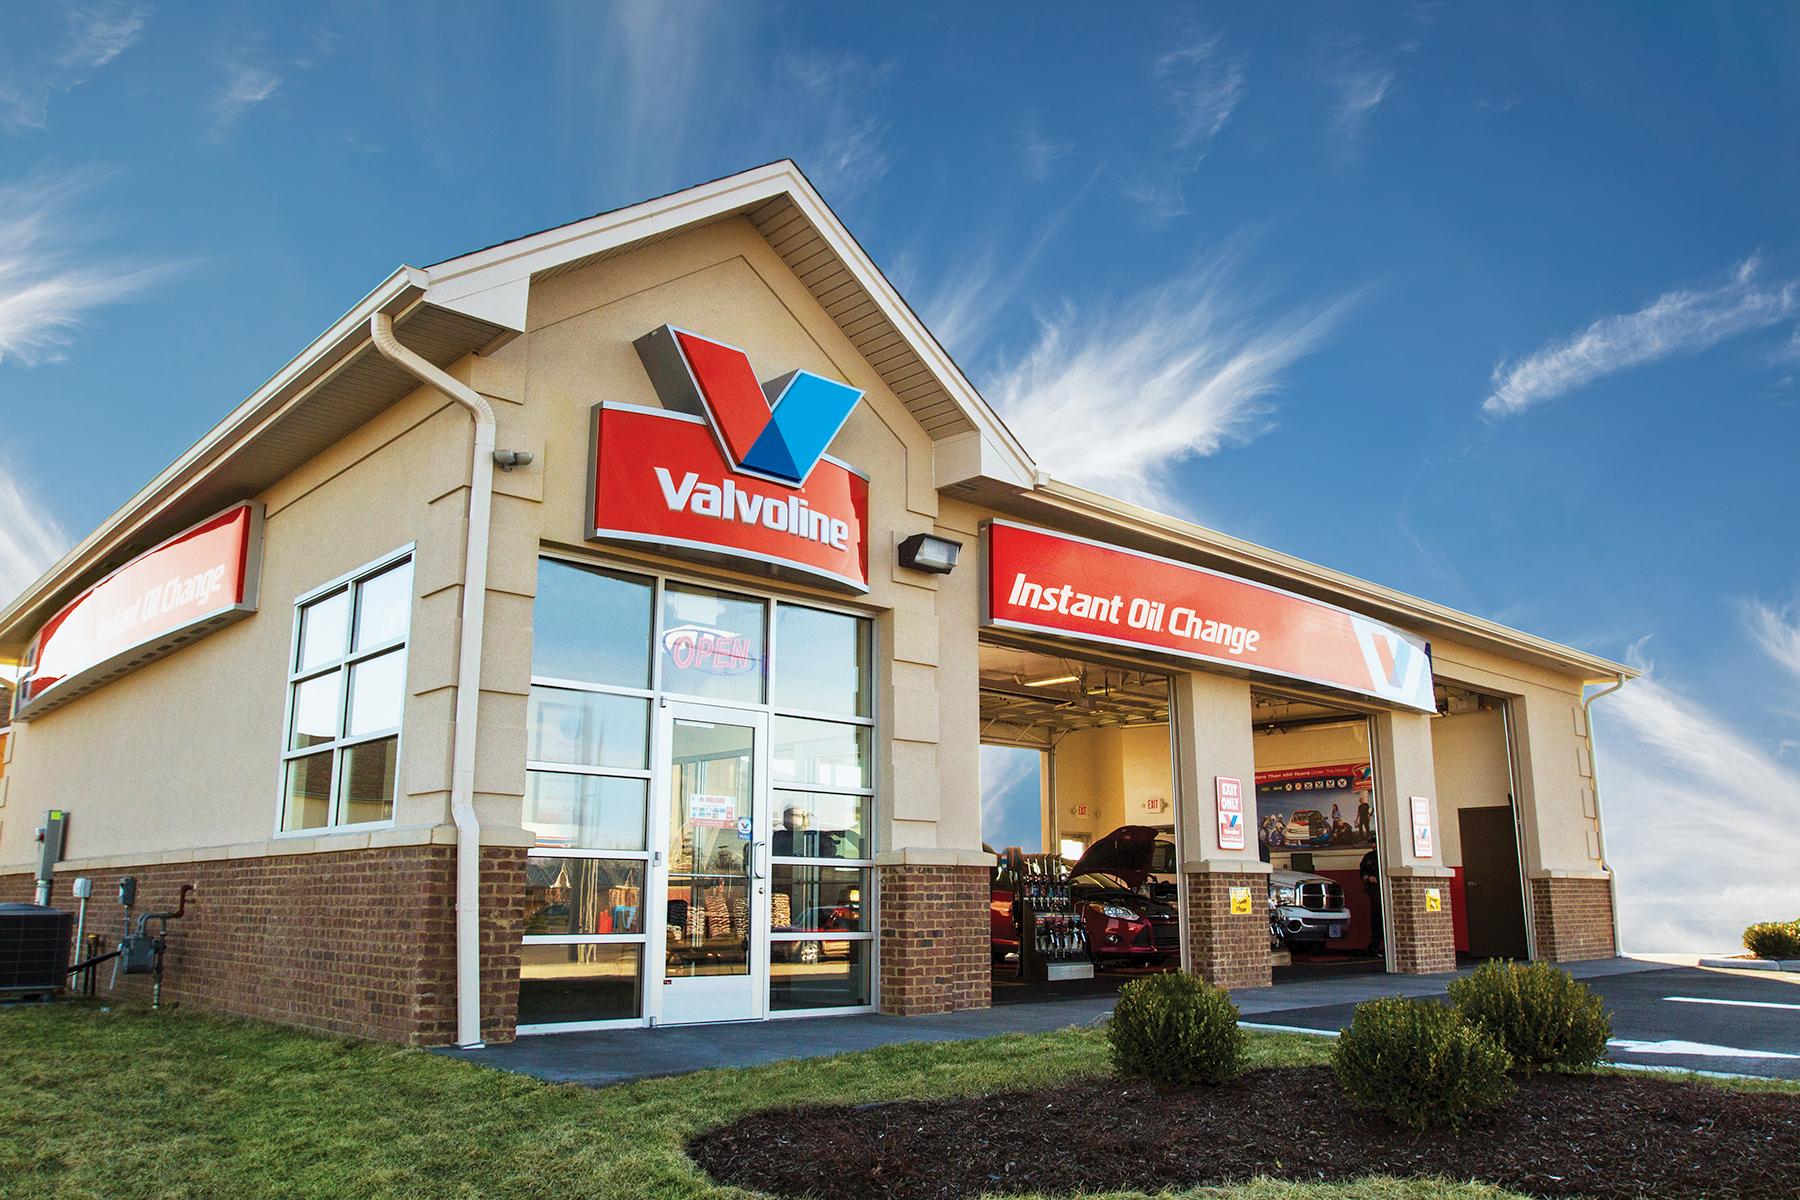 Valvoline Instant Oil Change 9670 Washington St Thornton Co 80229